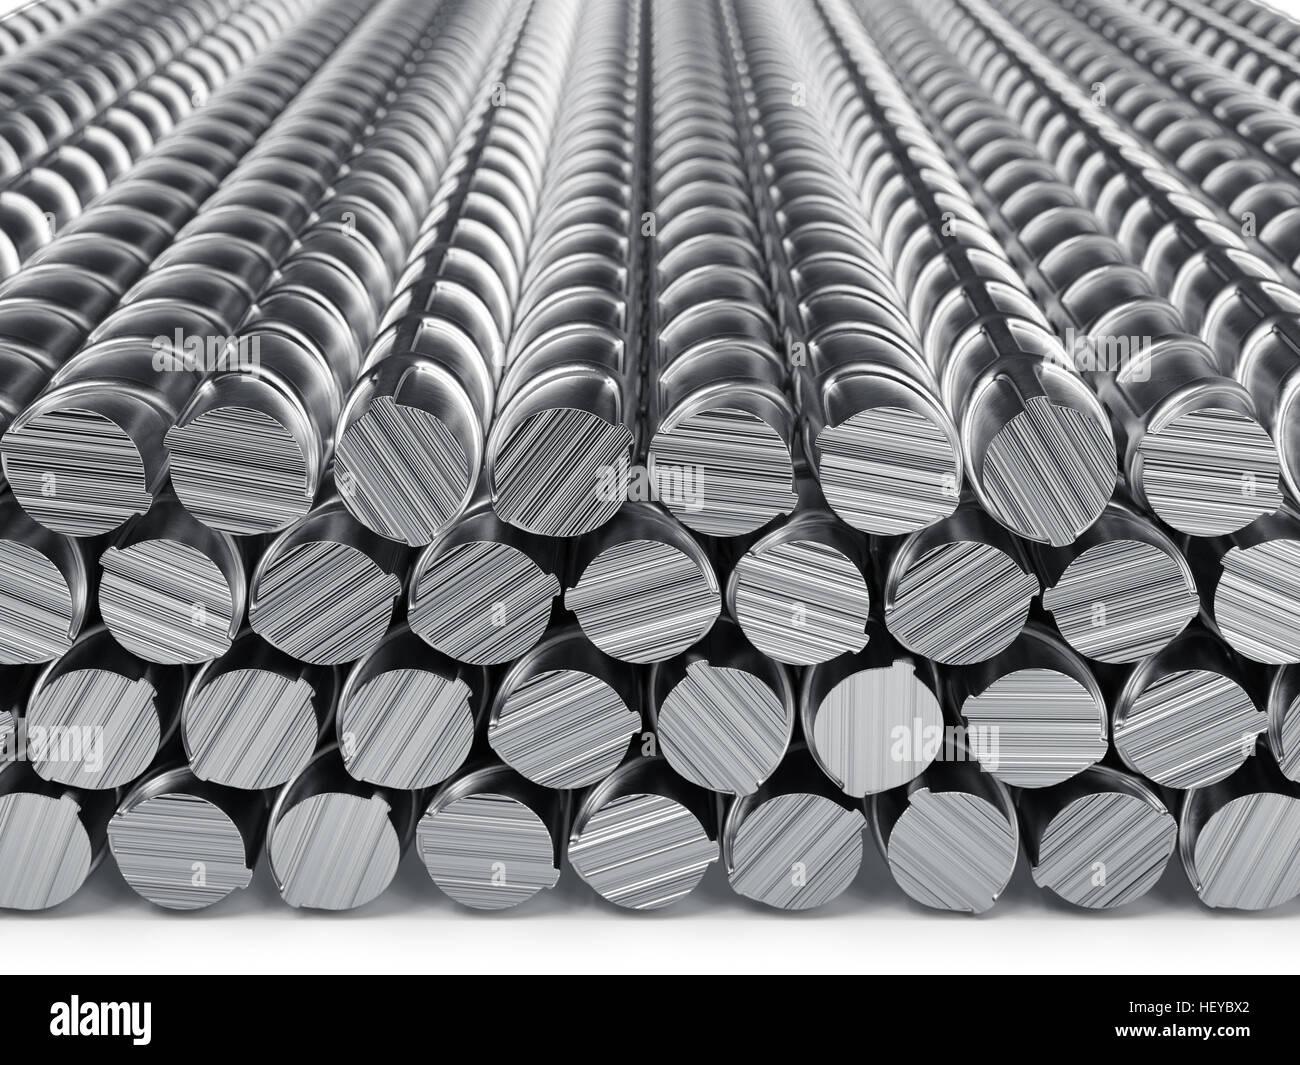 Rod Building Stockfotos & Rod Building Bilder - Seite 22 - Alamy